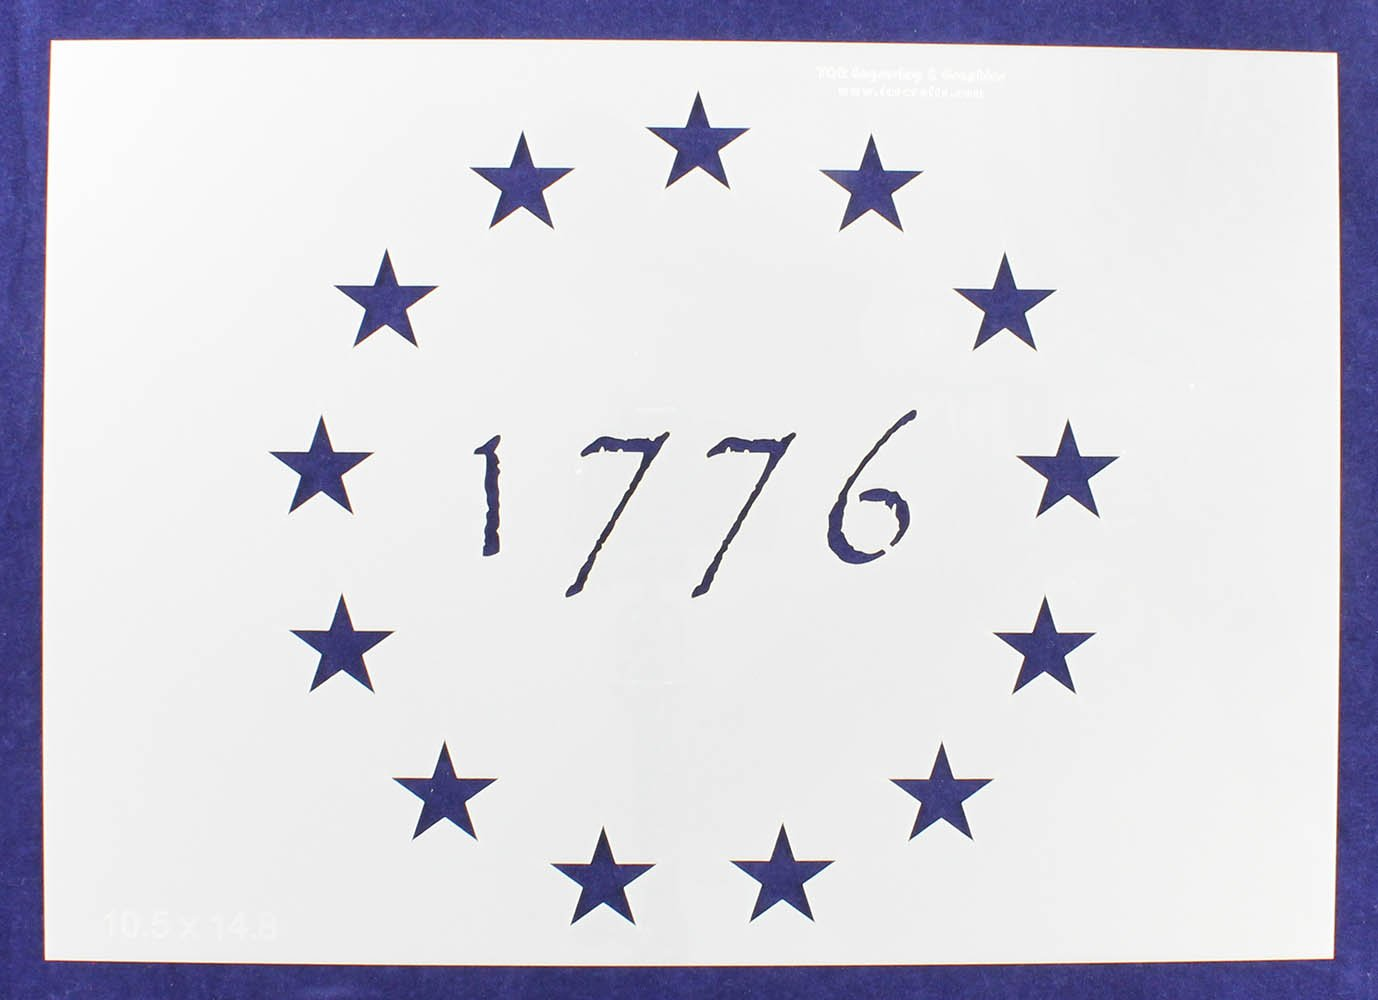 13 Star Revolutionary Field (1776) Stencil 14 Mil -10.5''H x 14.8''W - Painting /Crafts/ Templates